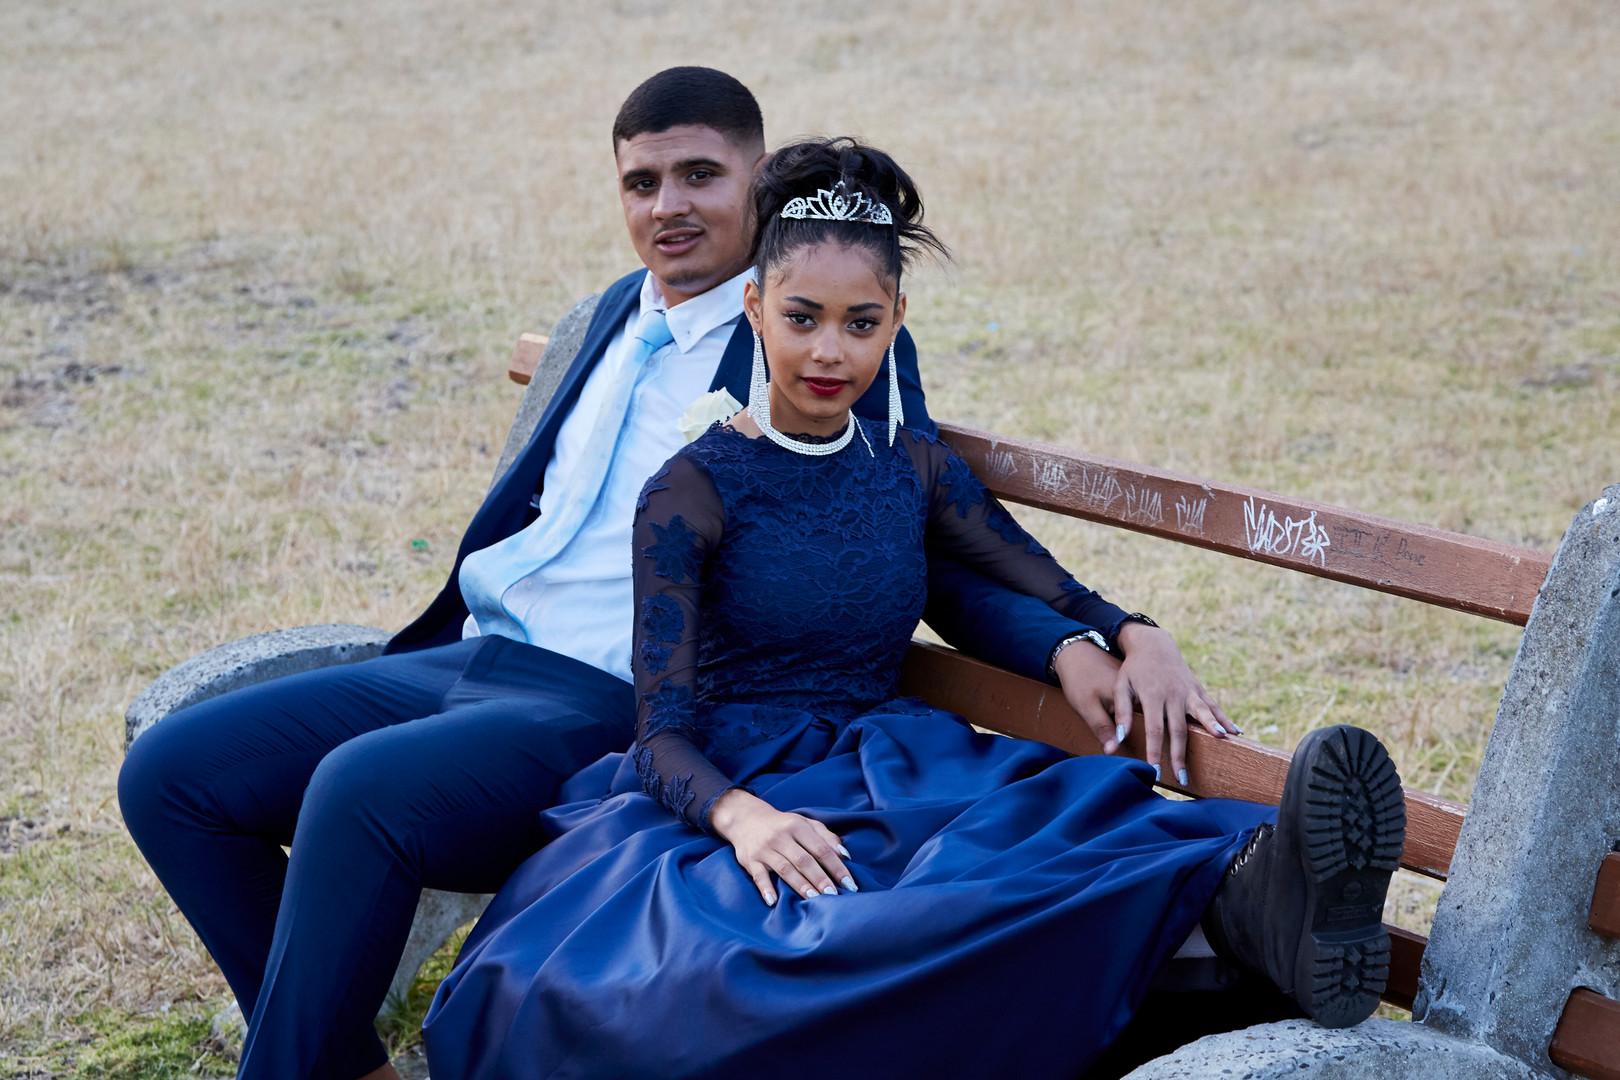 Bilaees Gamiet (17) from Salt River attended Salt River High's matric dance with her date Kivan Abbas. 29 Nov. 2019